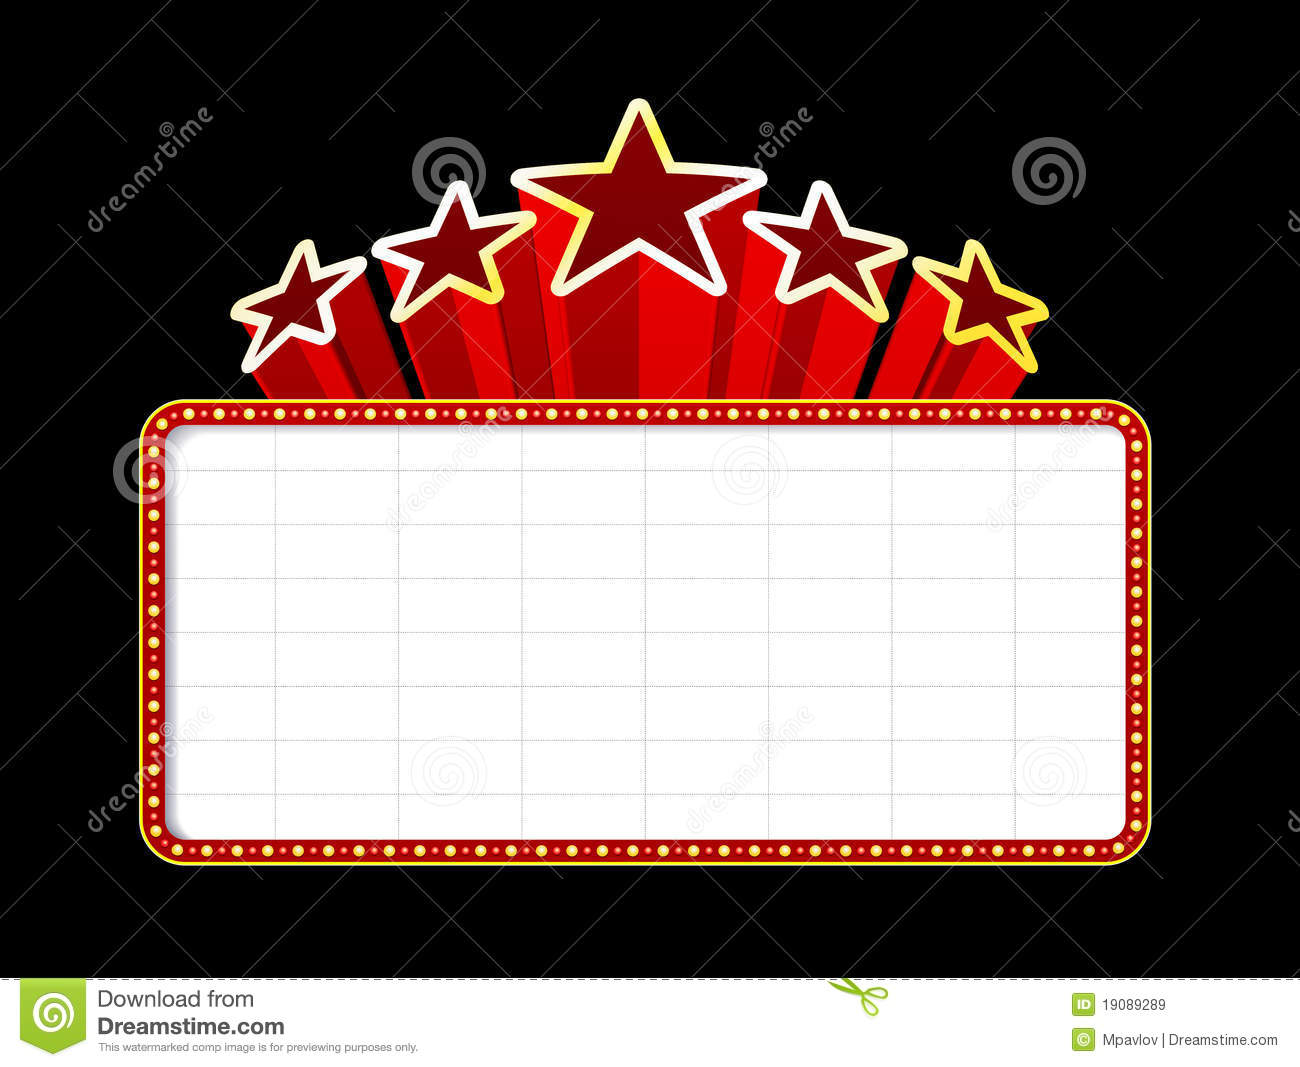 Ticket clipart broadway star, Ticket broadway star.